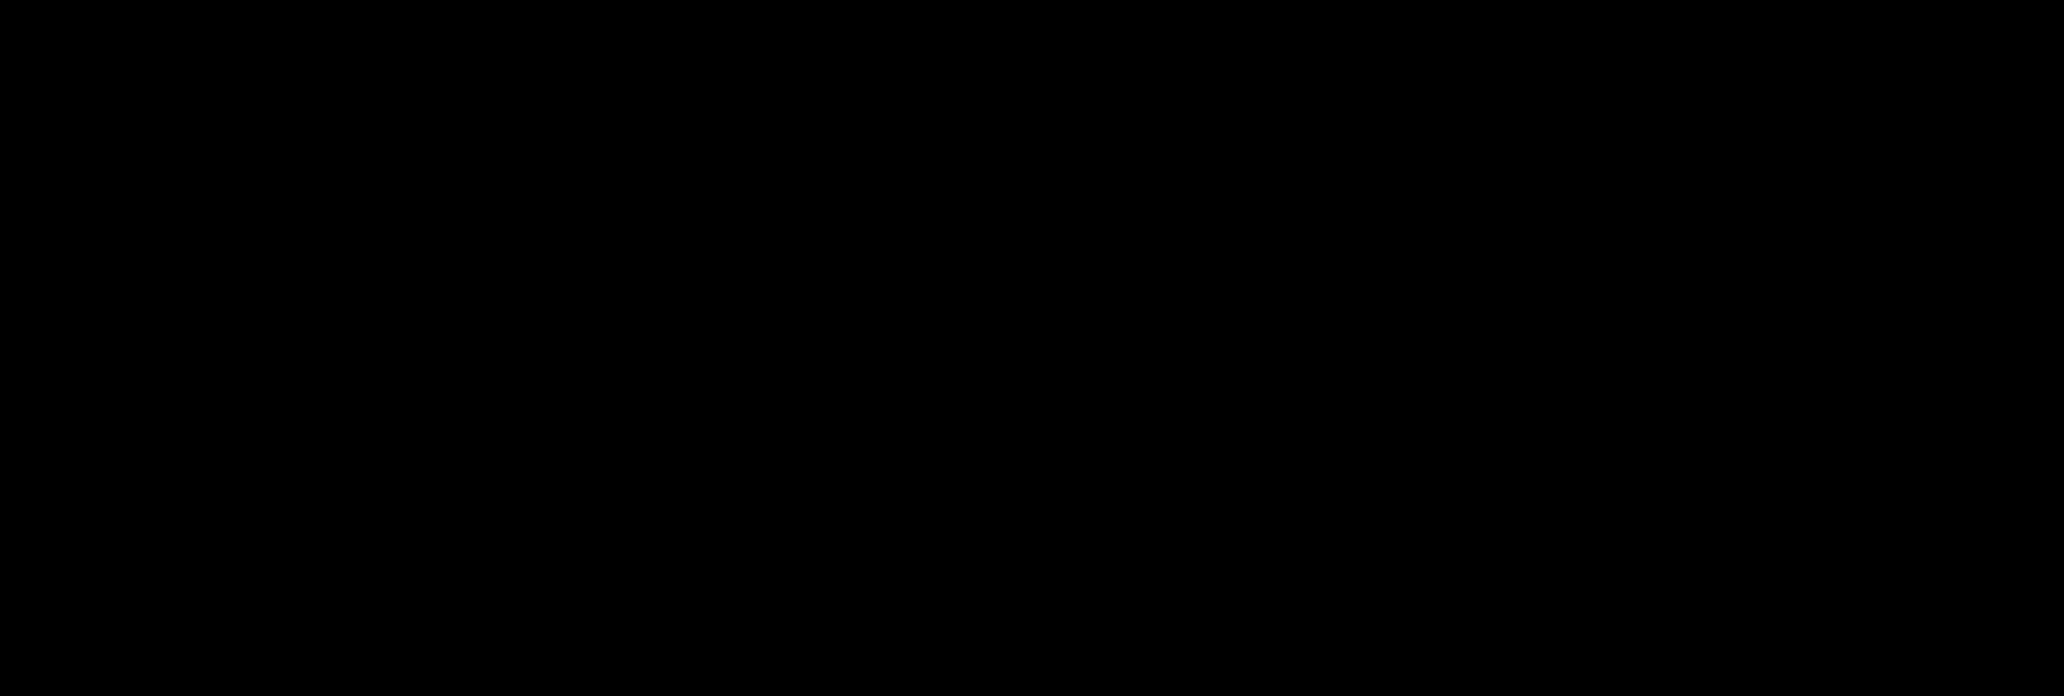 Dihydrocapsaicin-d<sub>3</sub>